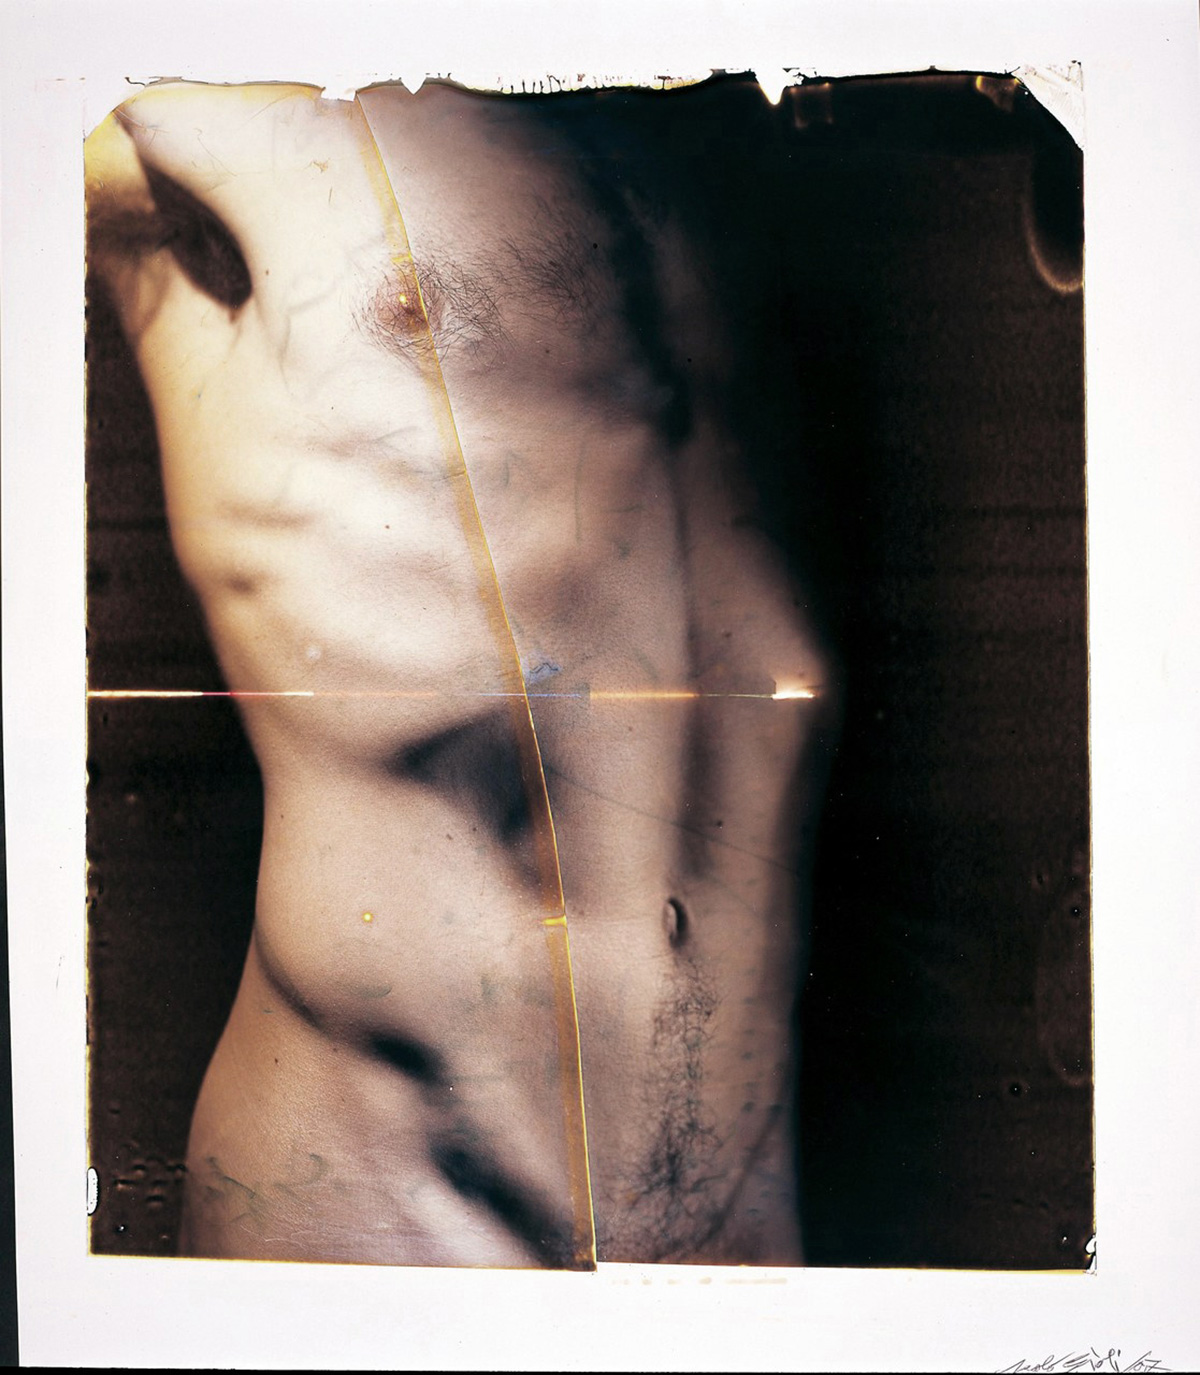 Paolo Gioli, Vessazioni (Abuses), 2007, Polaroid 20x24'' and transfers on acrylic, lens photograph